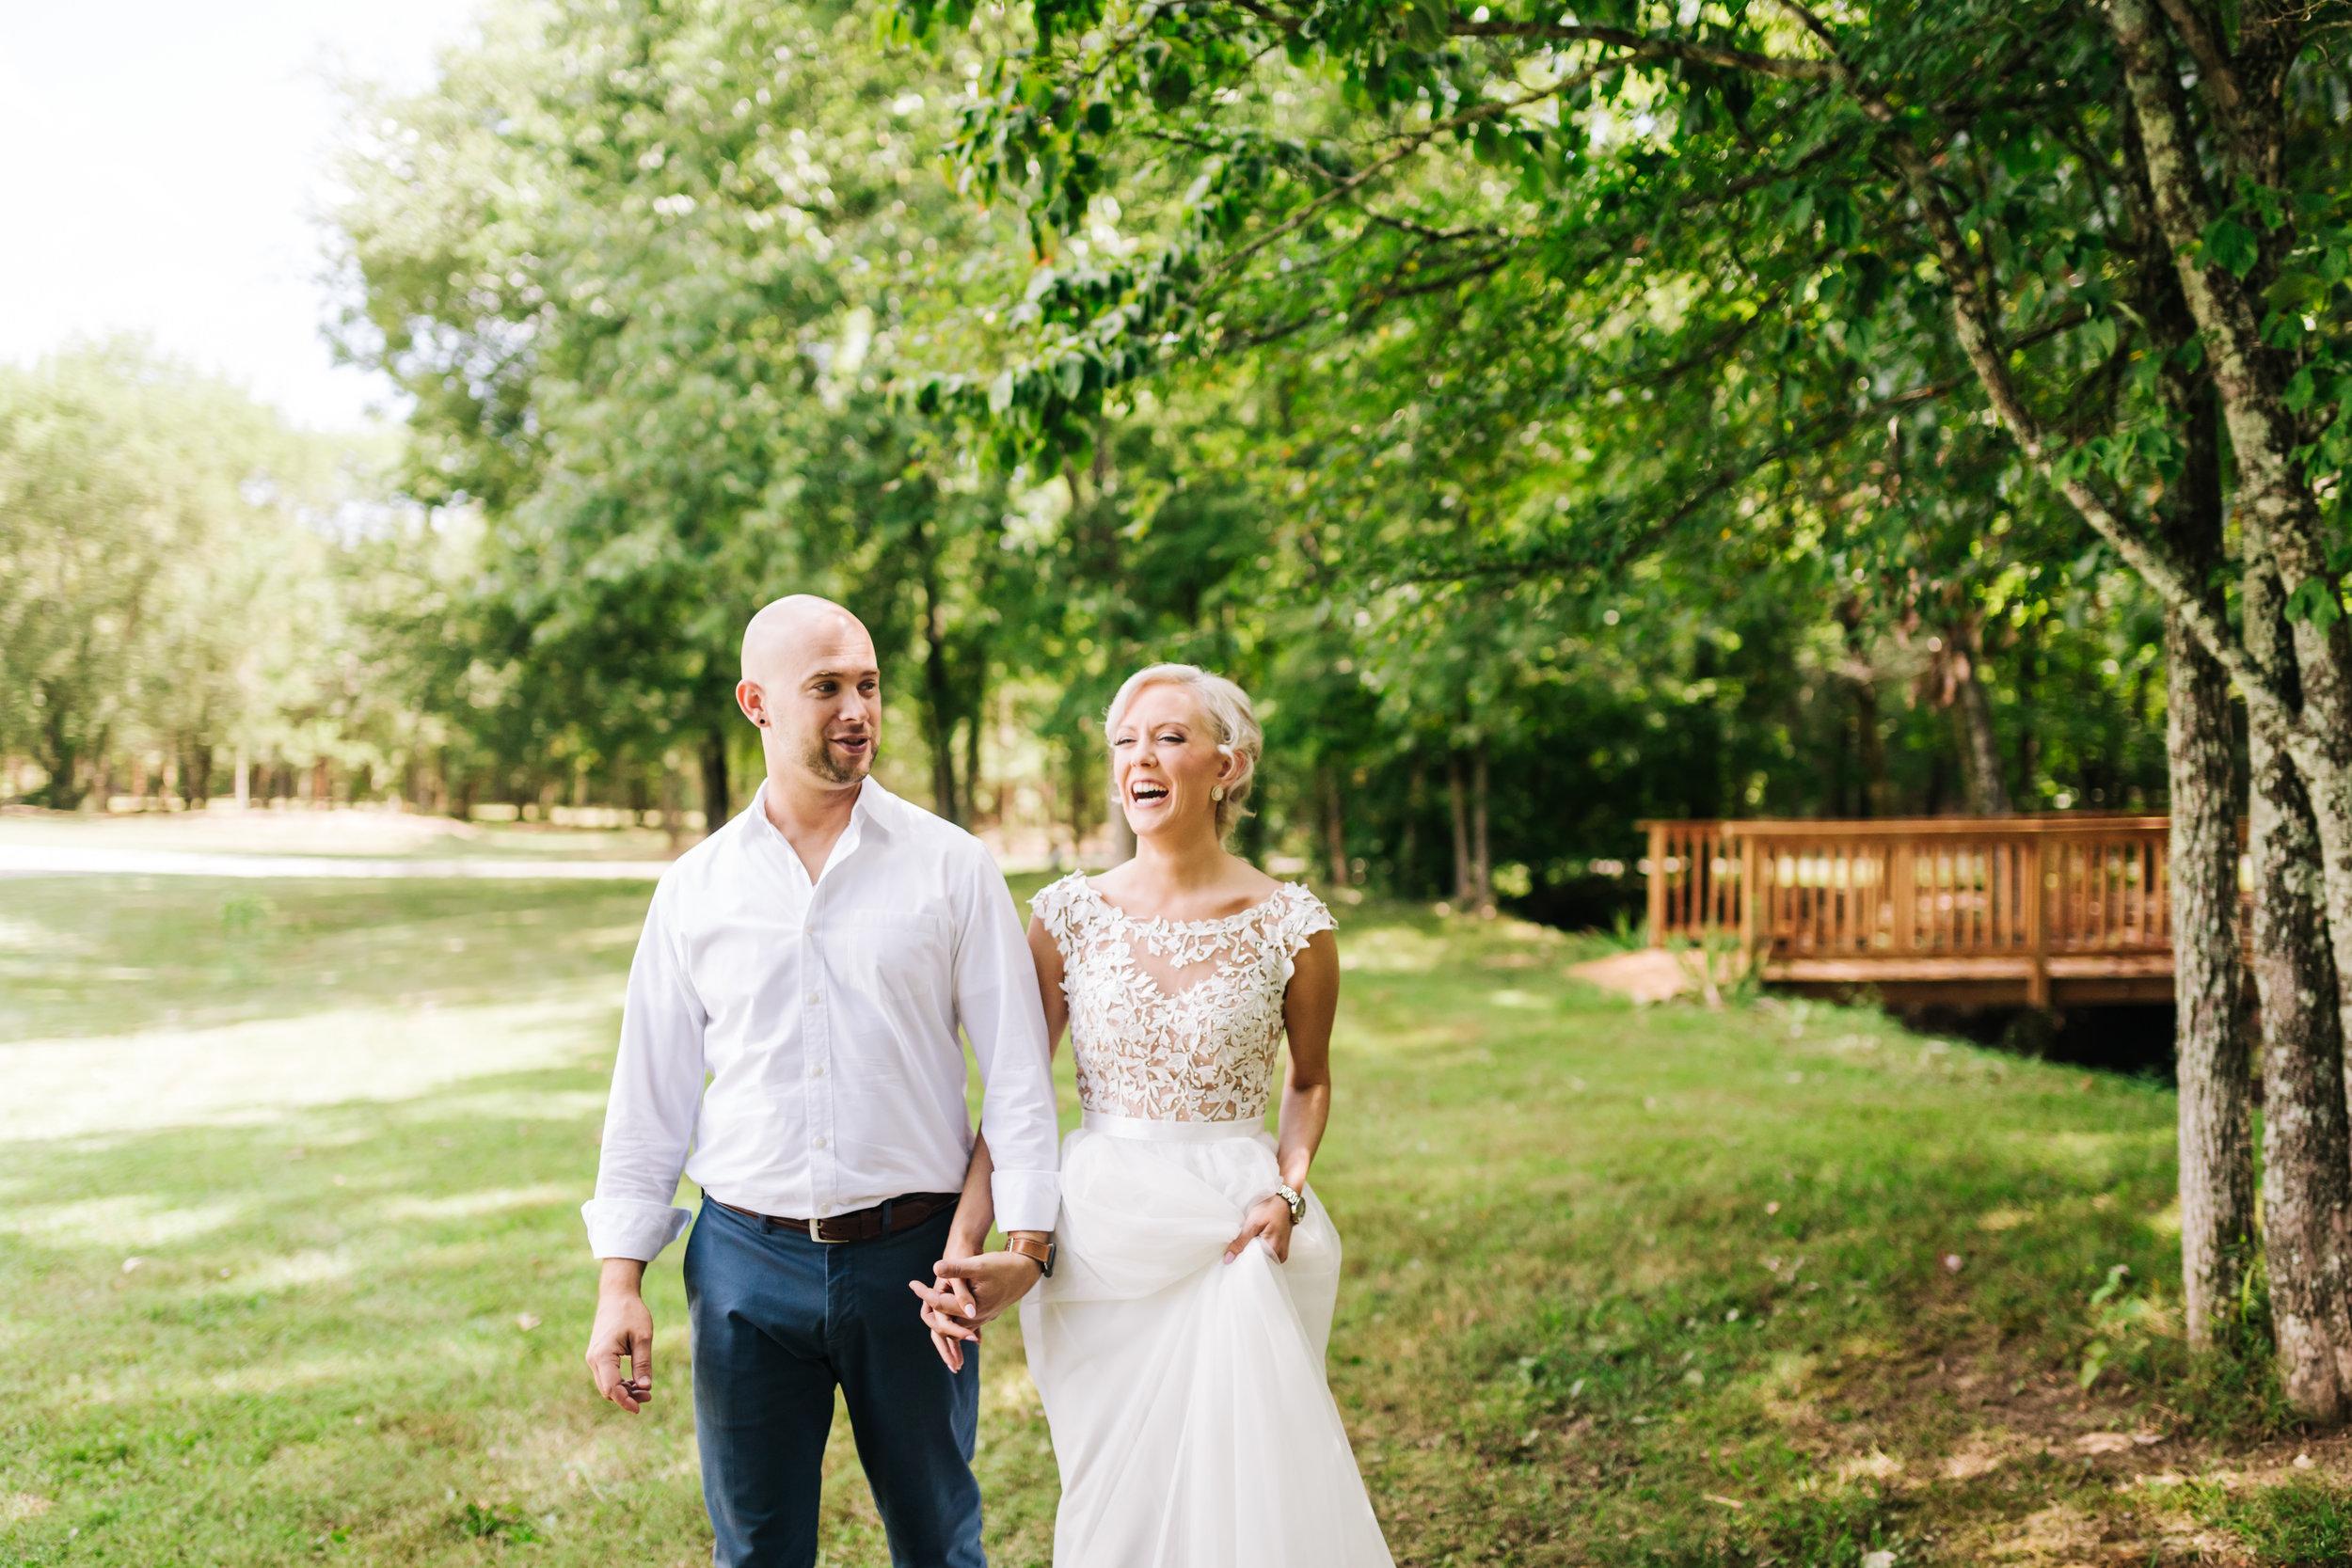 2018.09.02 Ray and Sarah Prizner Nashville TN Wedding FINALS-100.jpg